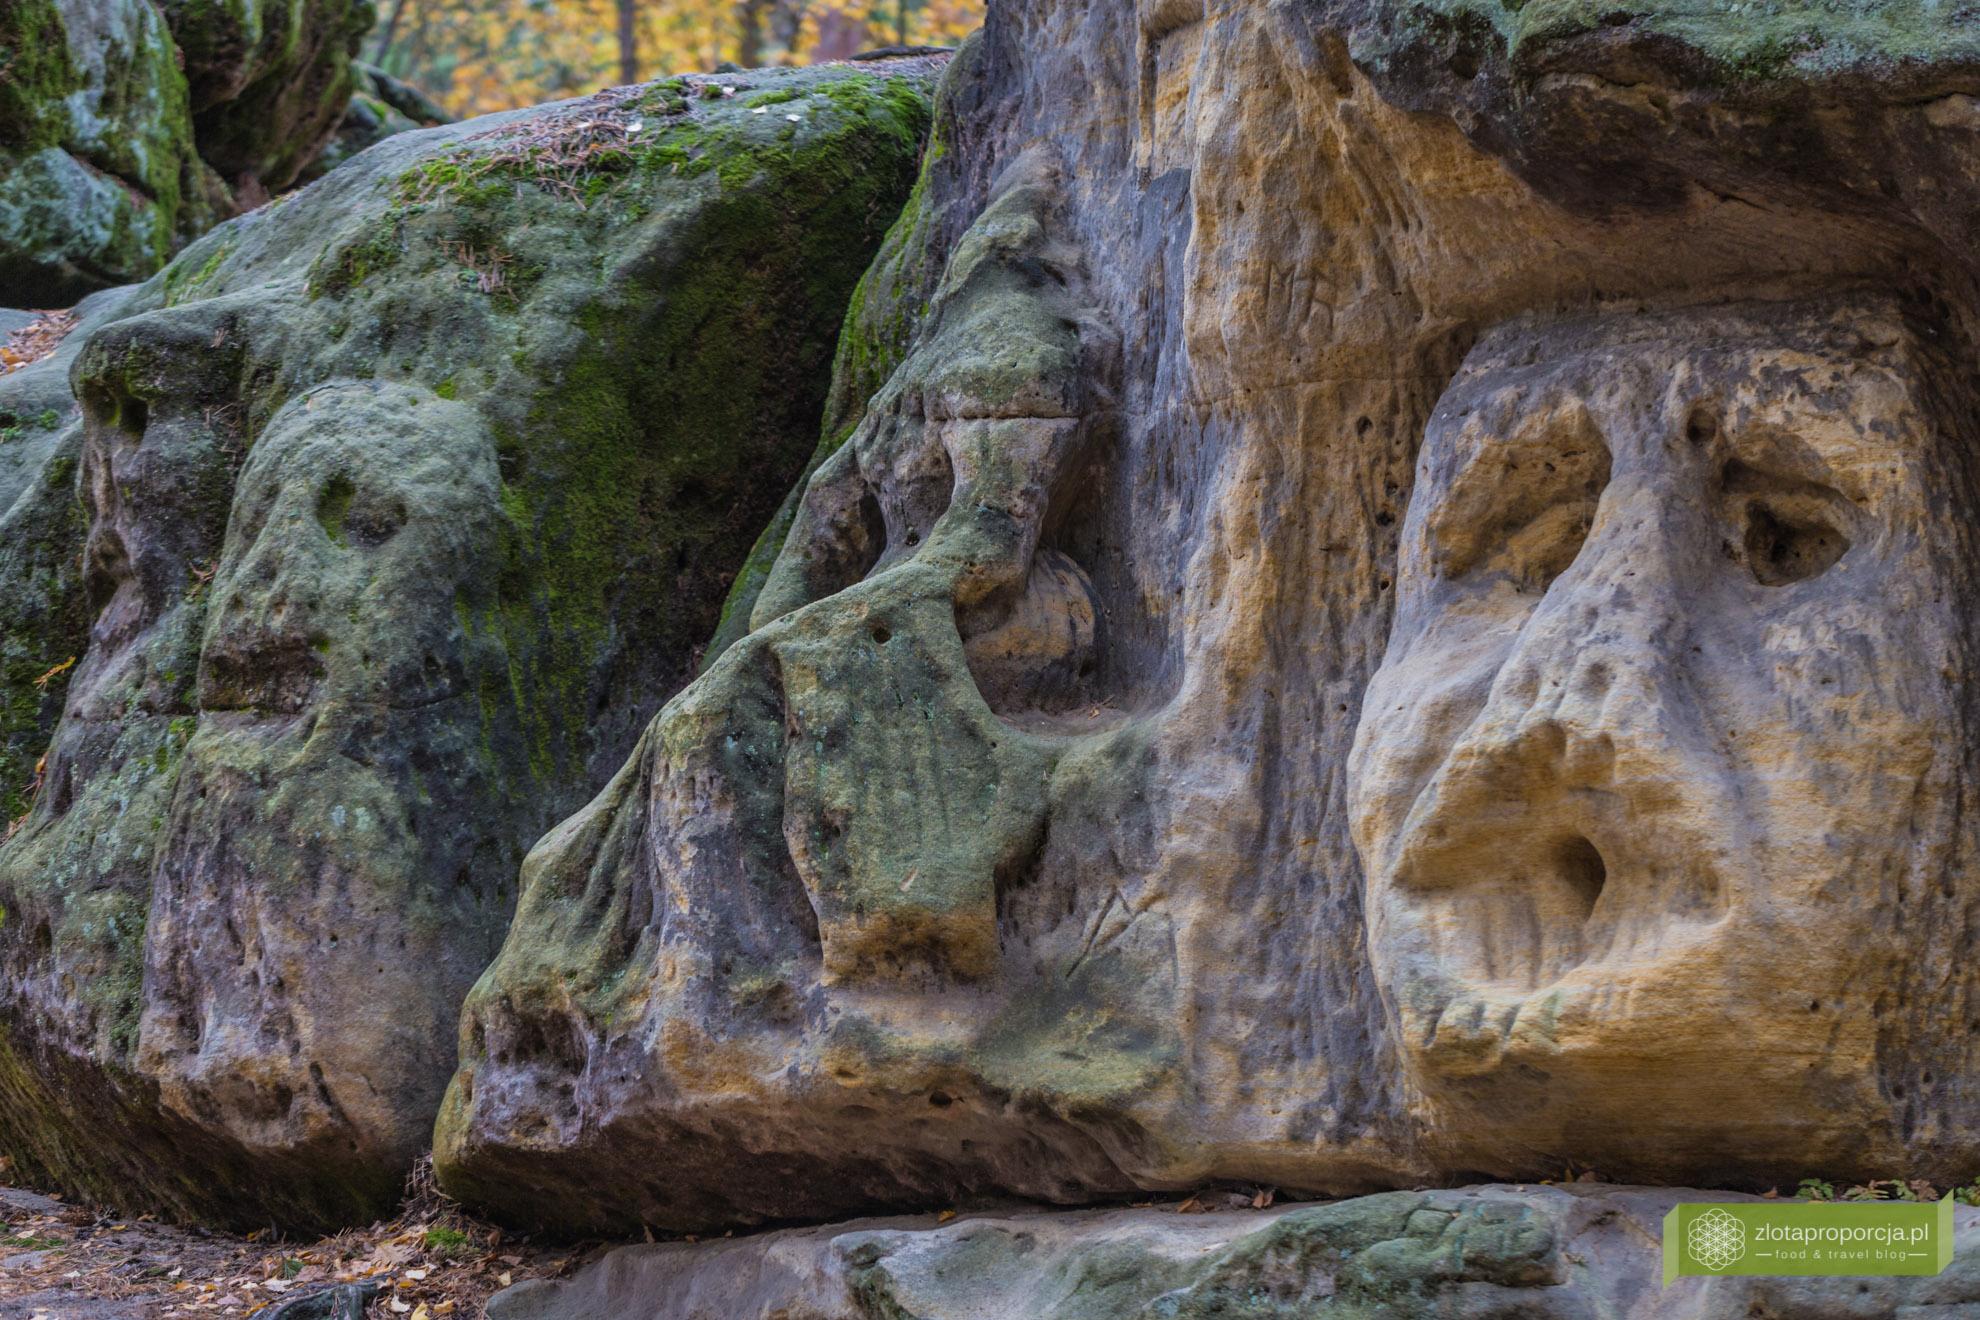 Harfenice, Kokorinsko, atrakcje Kokorinsko, sklane rzeźby Vaclava Levy, okolice Pragi, Czechy